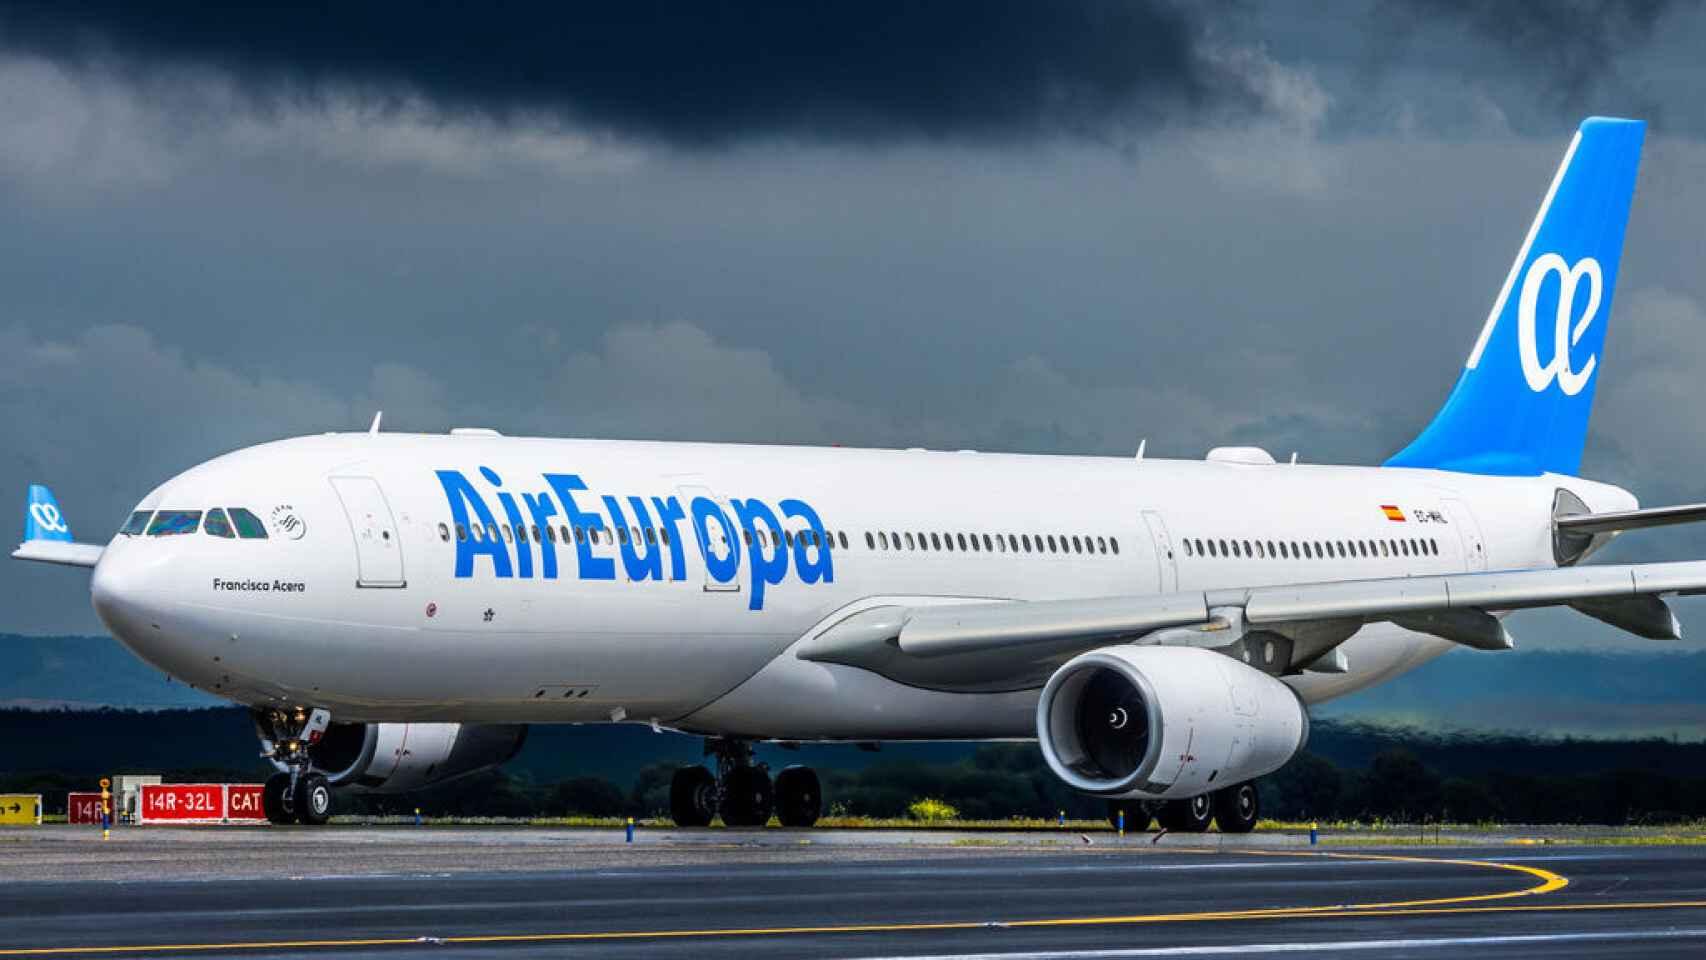 Un avión de Air Europa en un aeropuerto.